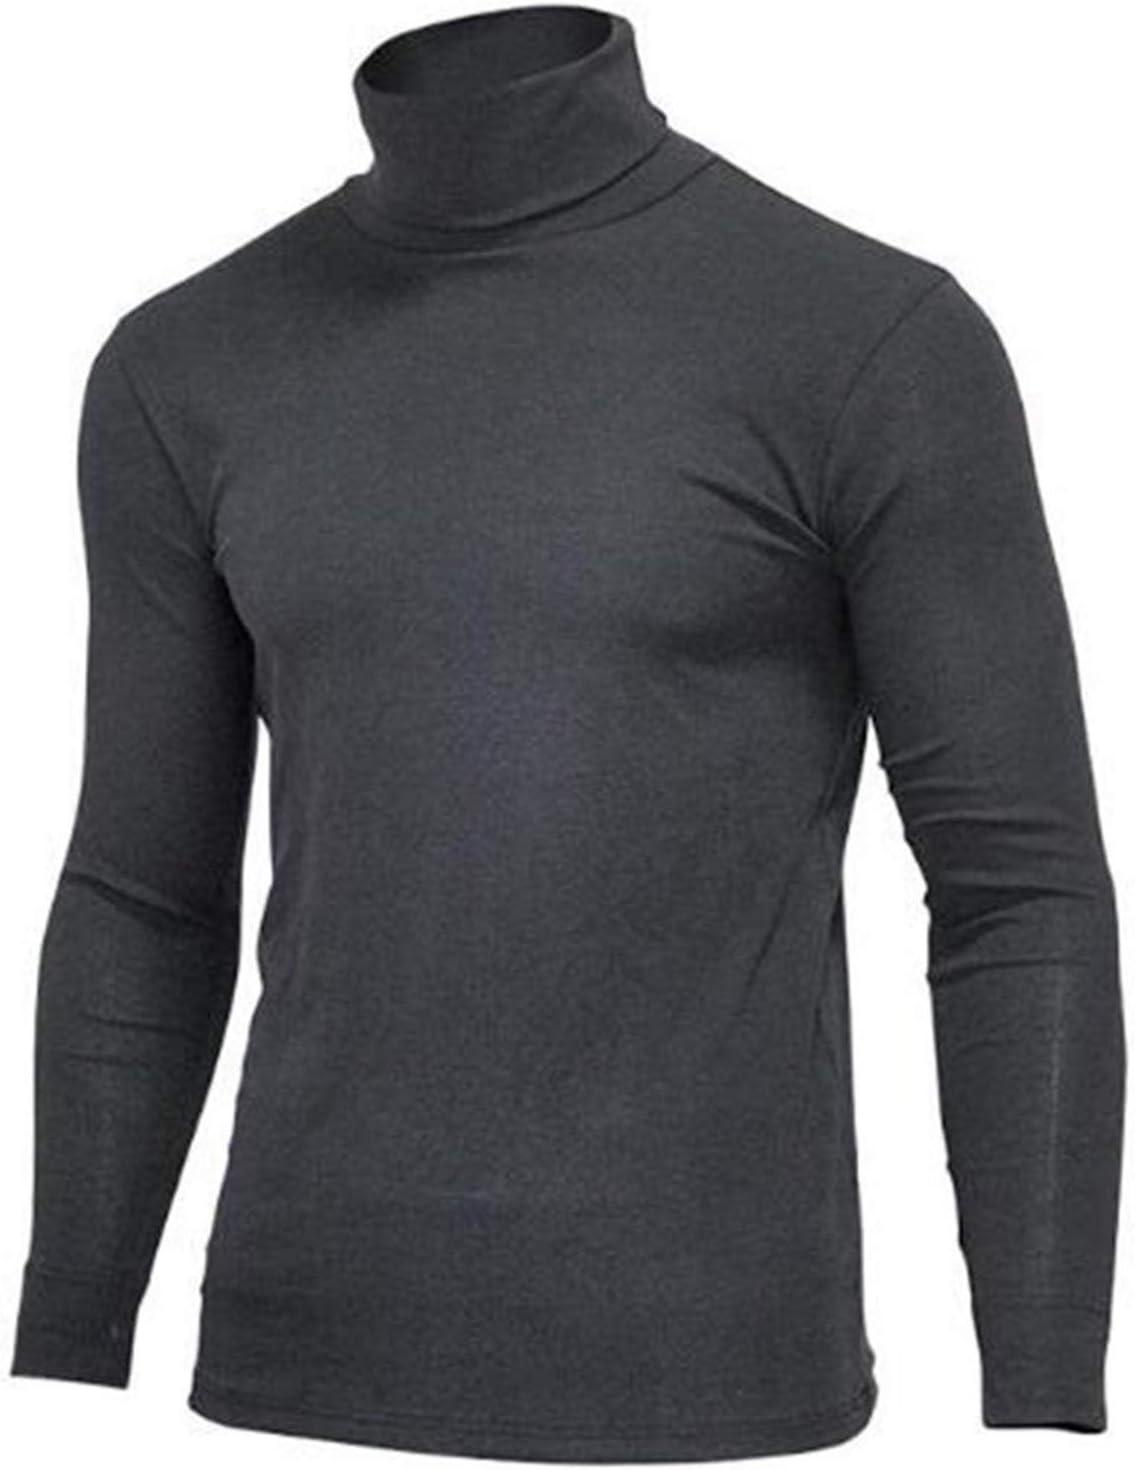 QWERBAM Cotton Thermal Underwear Collar Mens Plus Size Tops Turtleneck Long Sleeves Men Elastic T Shirts (Color : Black, Size : L.)